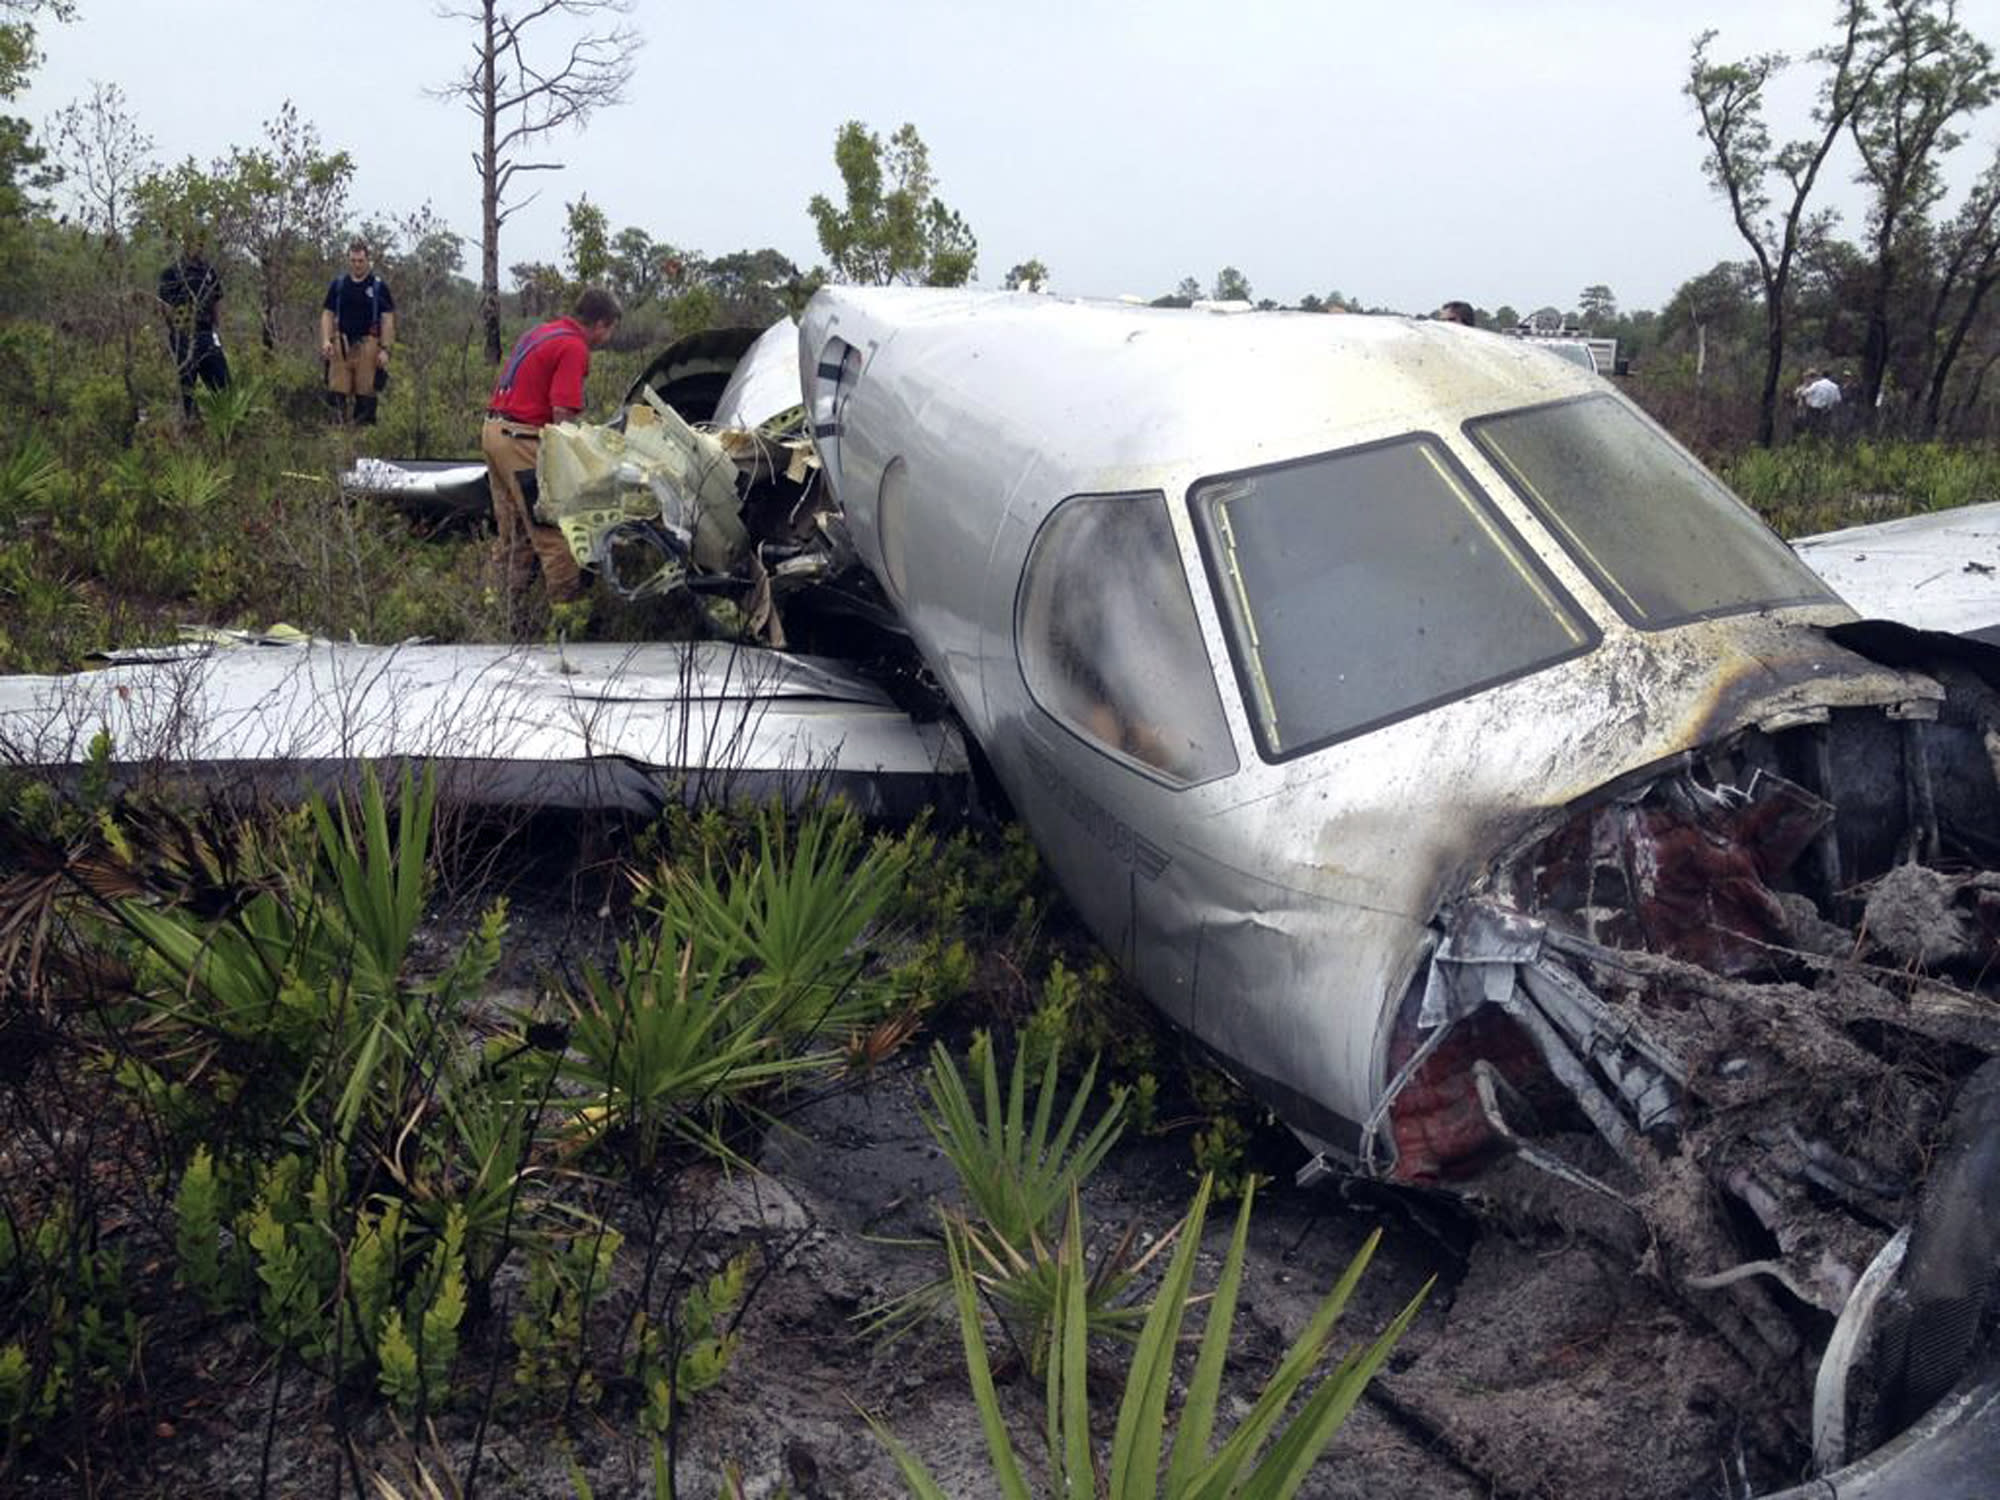 Kansas family killed in plane crash in Fla  swamp